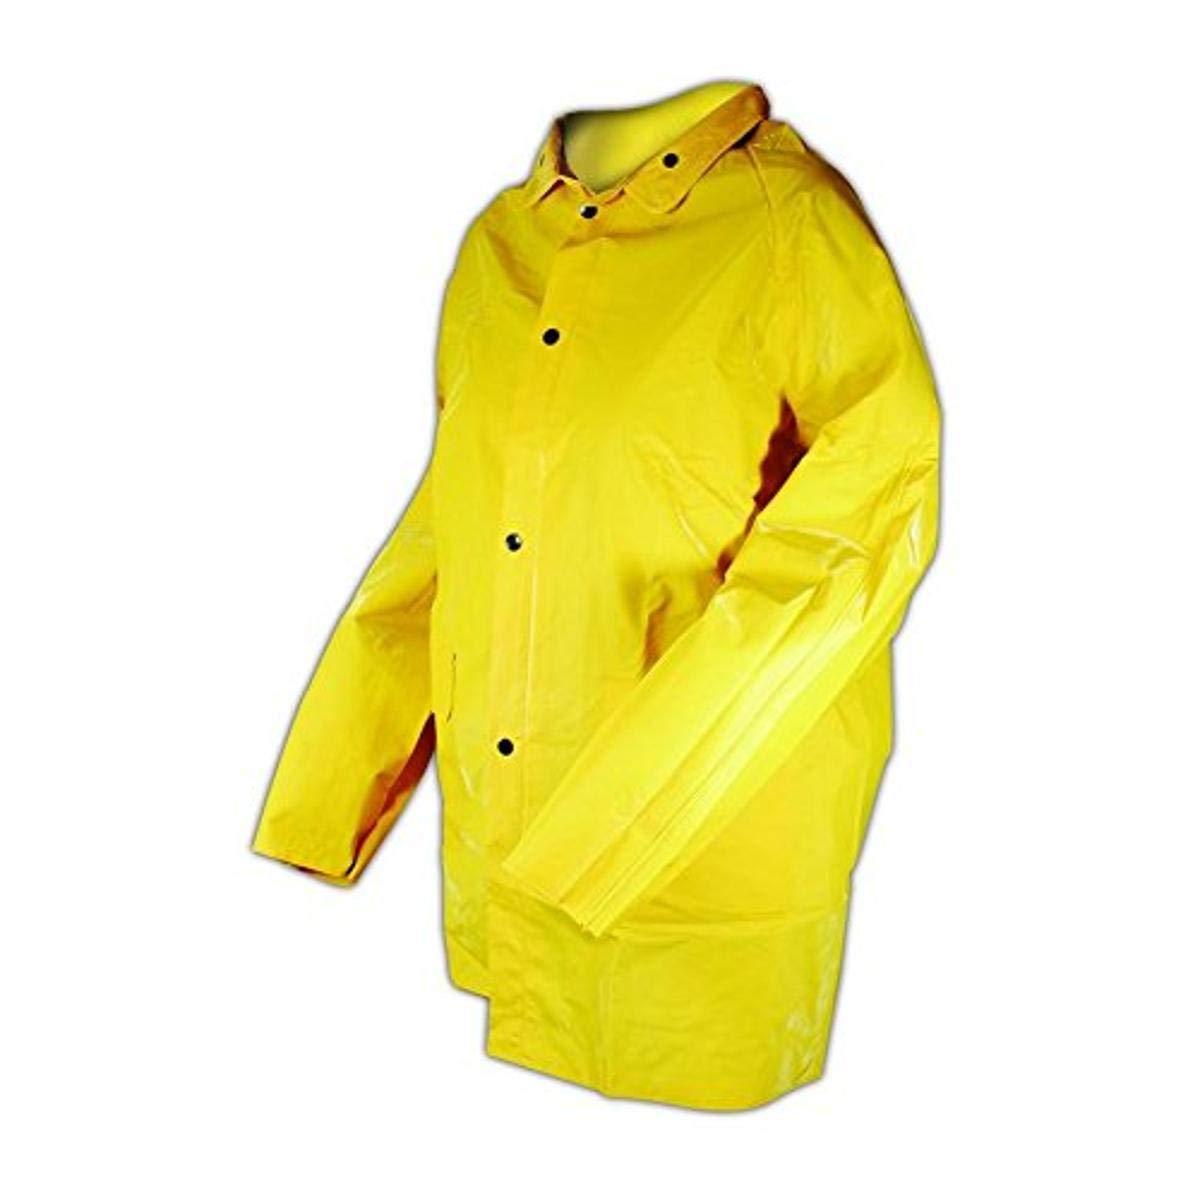 1 Jacket XXXXXL Magid RainMaster PVC Supported 14 MIL Yellow Rain Jacket with Hood